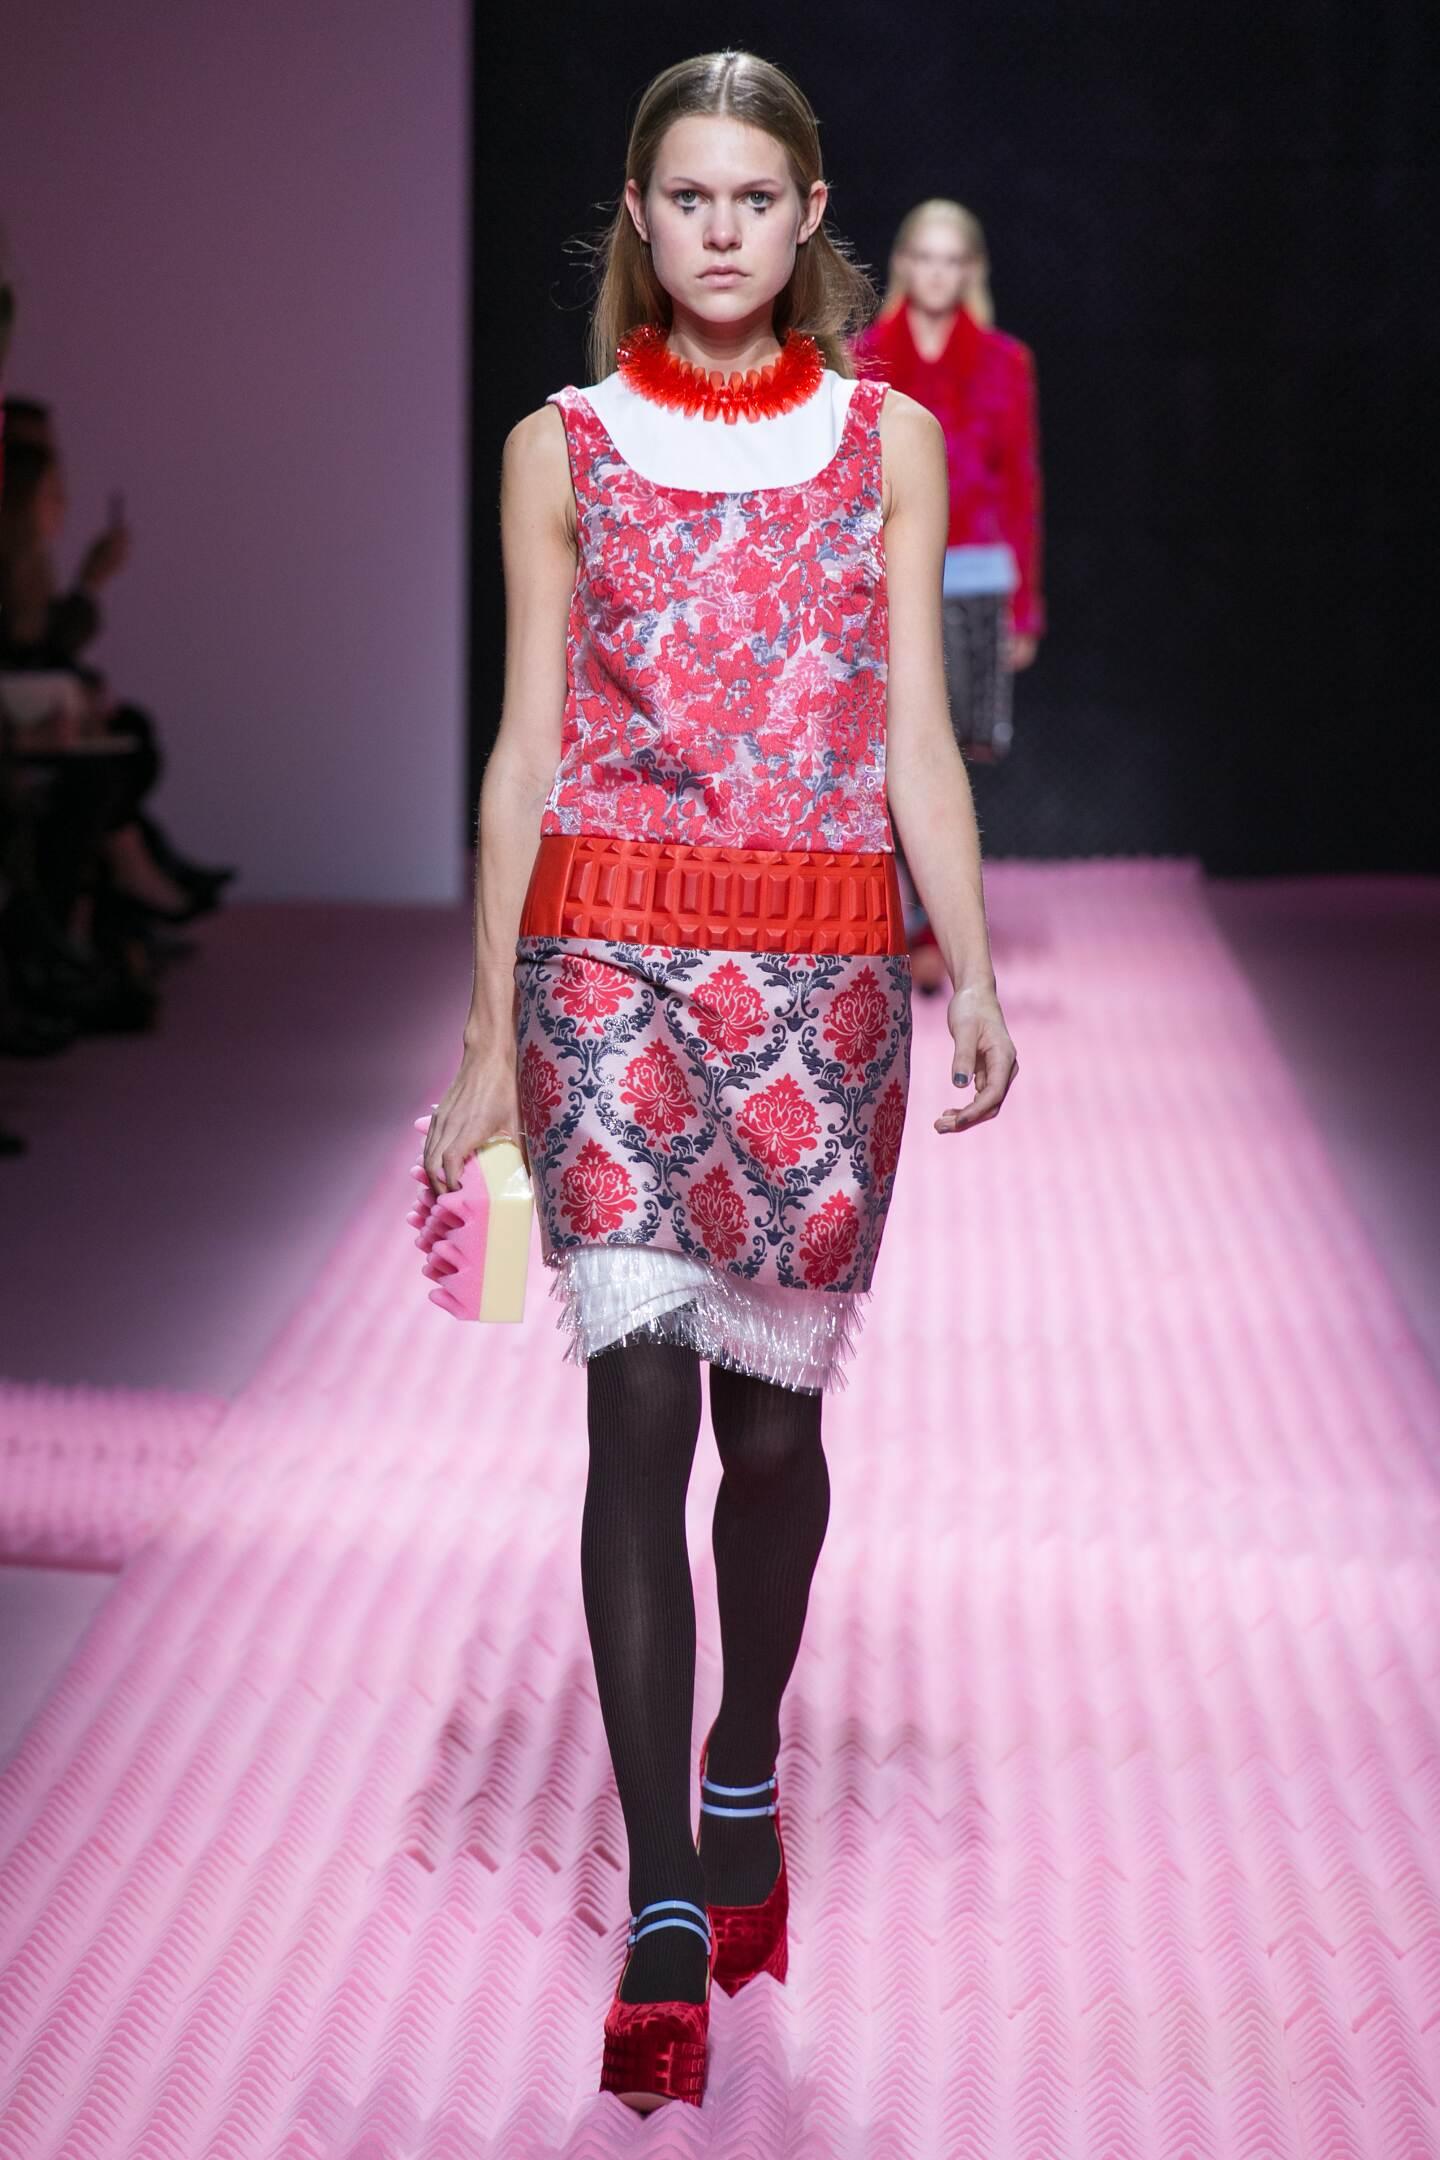 Fashion Model Mary Katrantzou Collection Catwalk